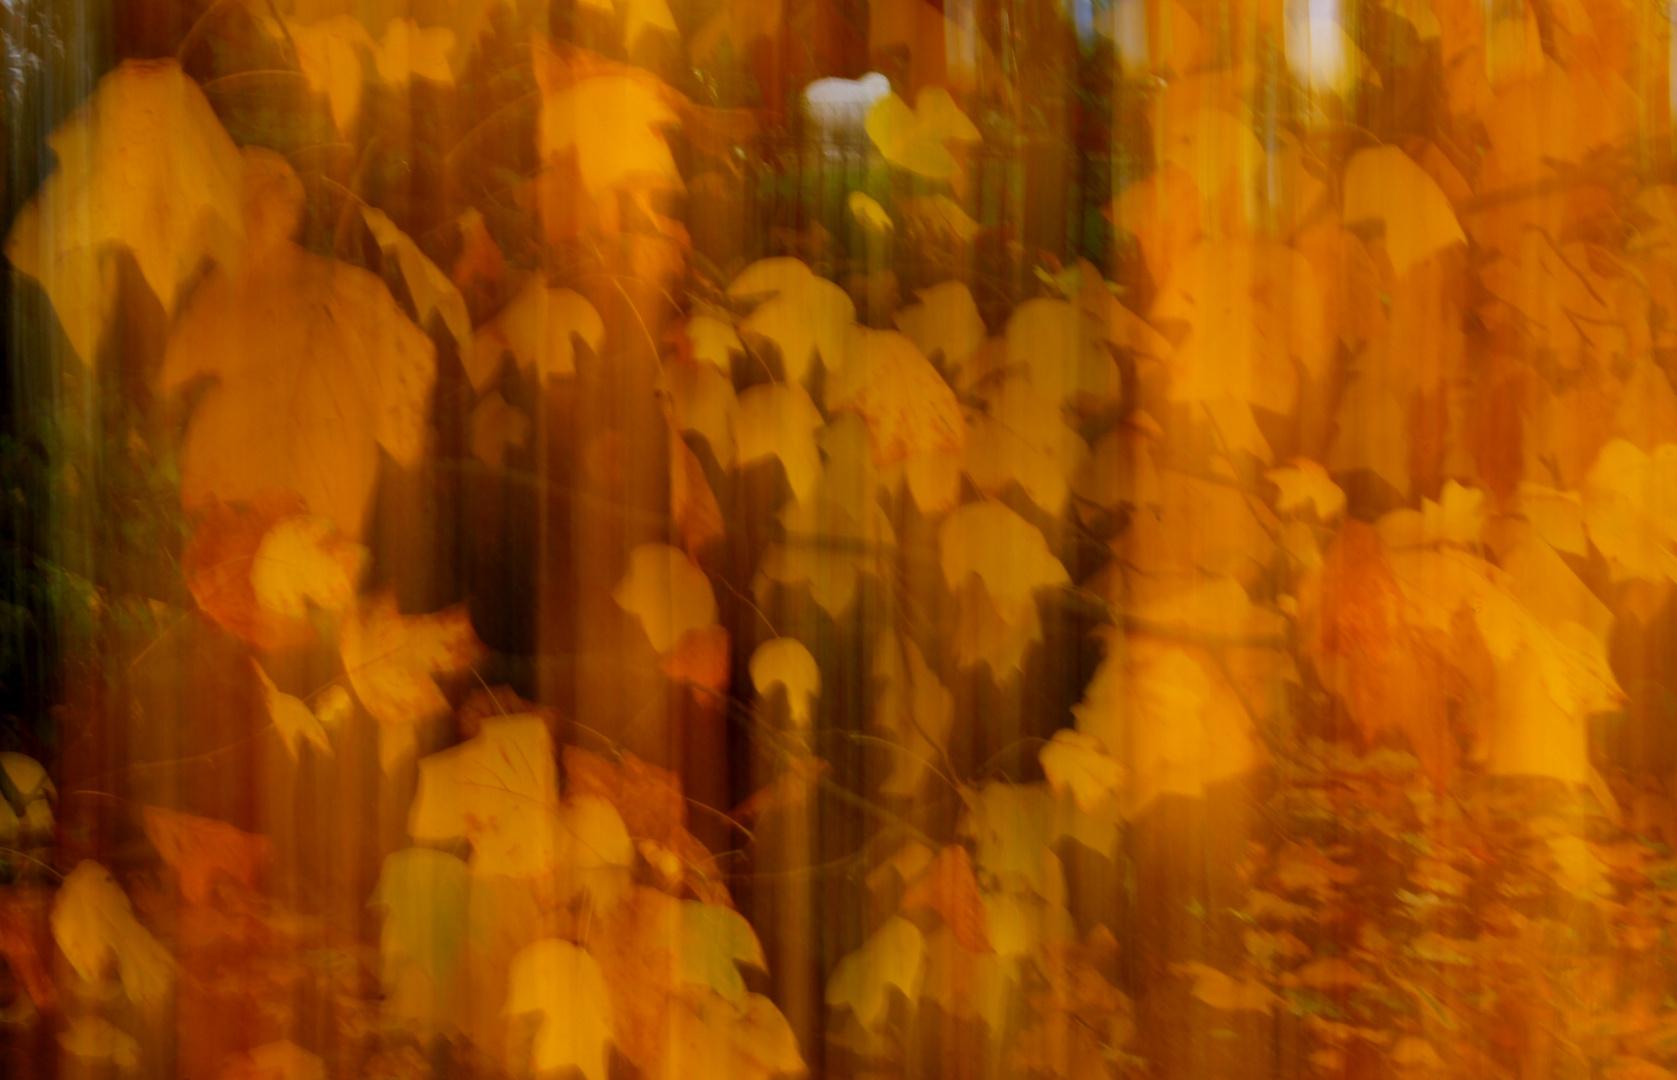 Herbst-Impressionen I